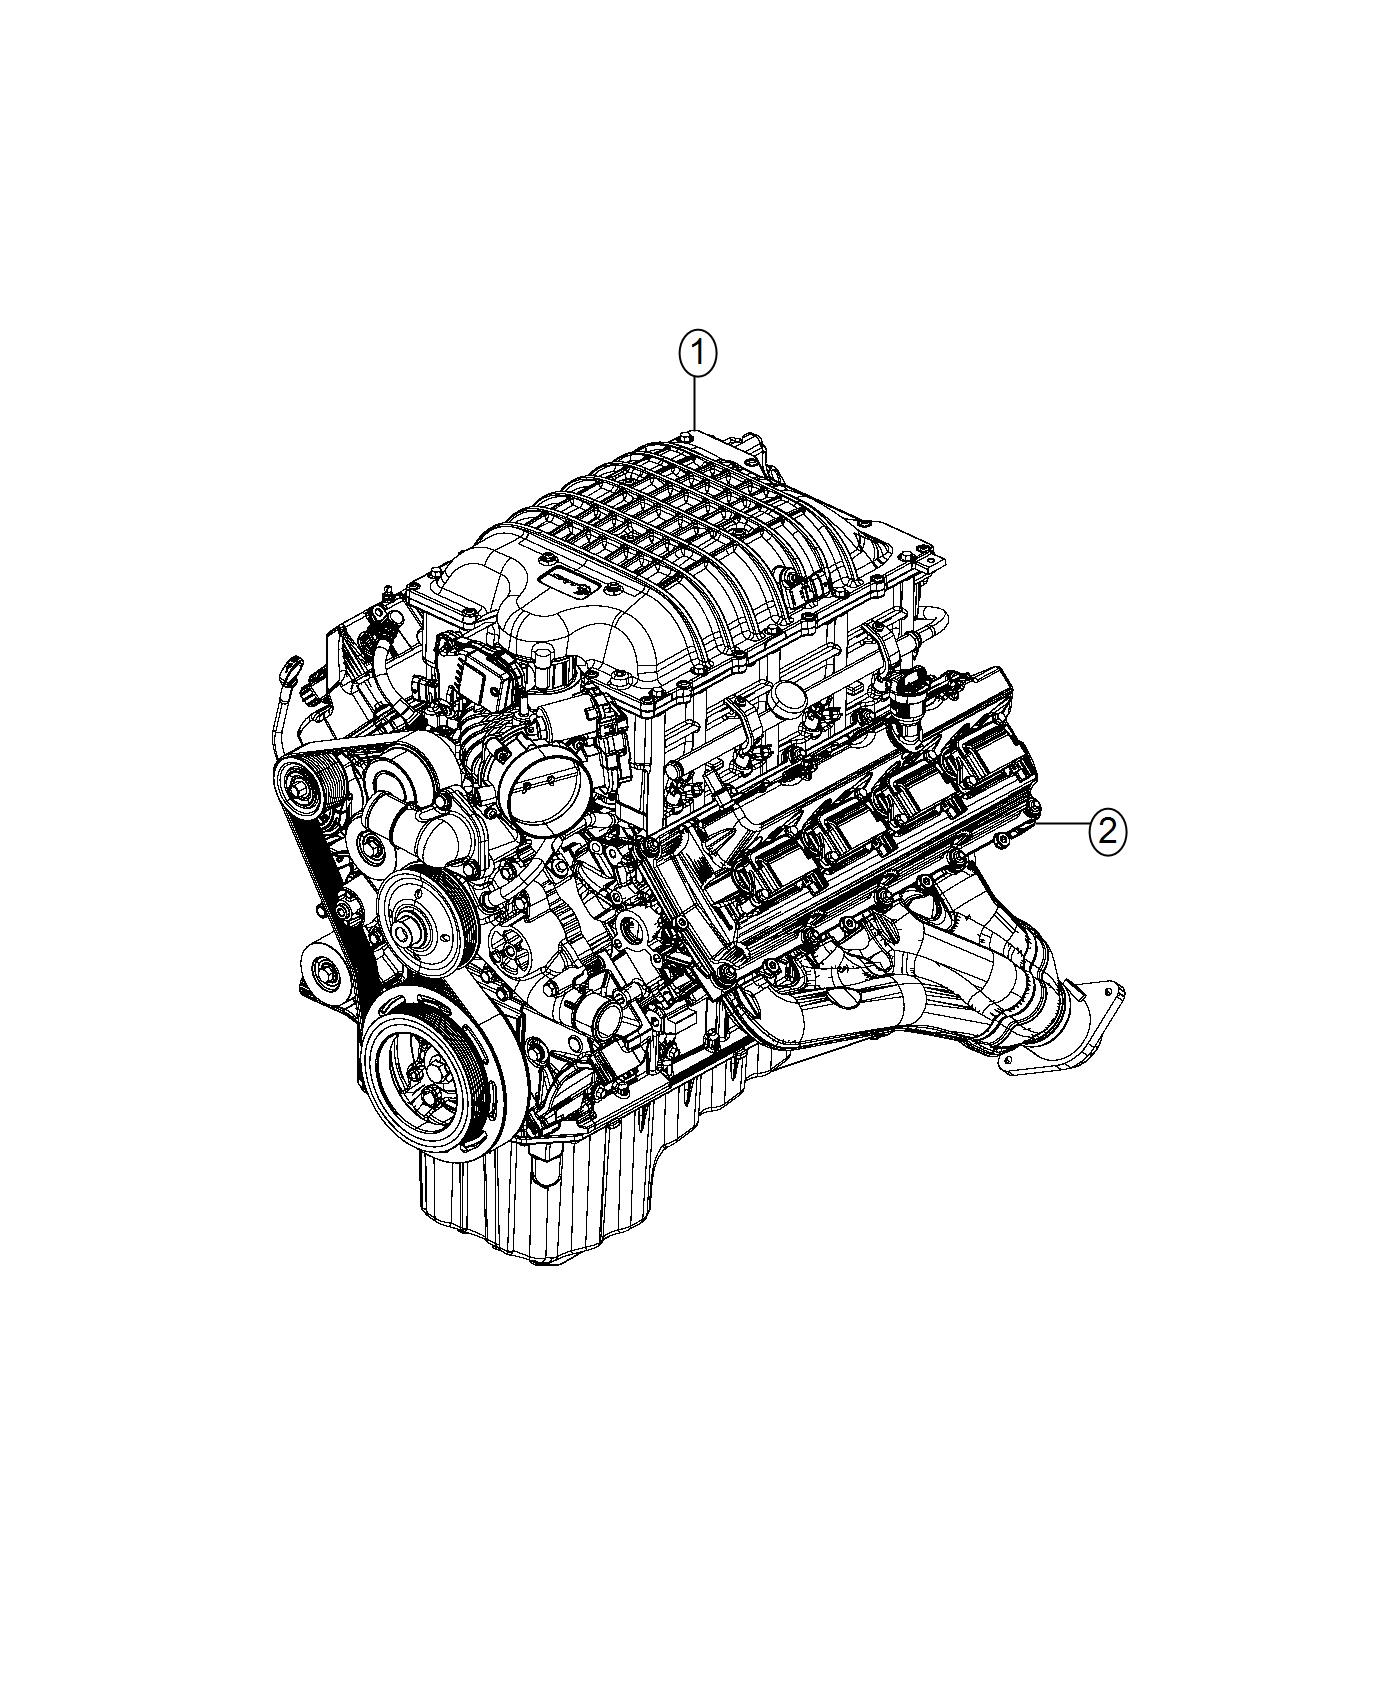 Dodge Charger Engine Long Block